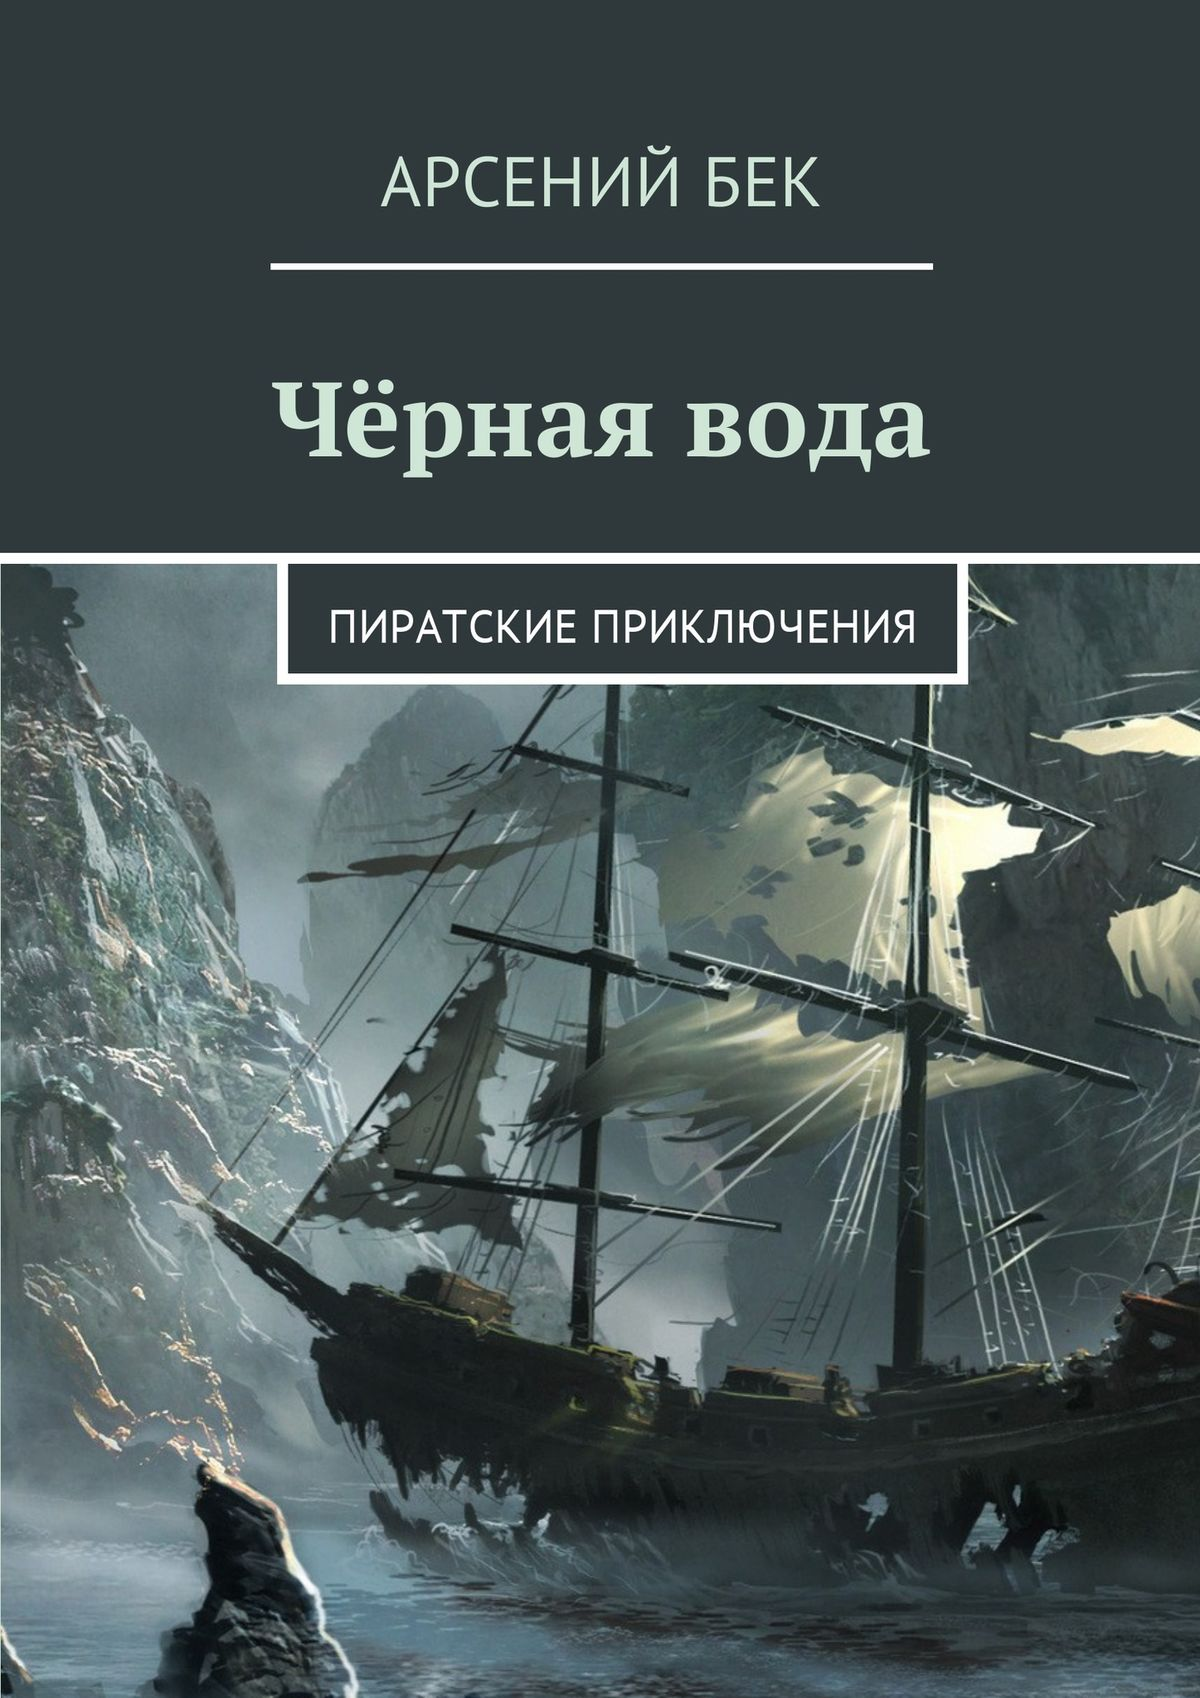 Арсений Бек Чёрнаявода. Пиратские приключения арсений бек чёрнаявода пиратские приключения